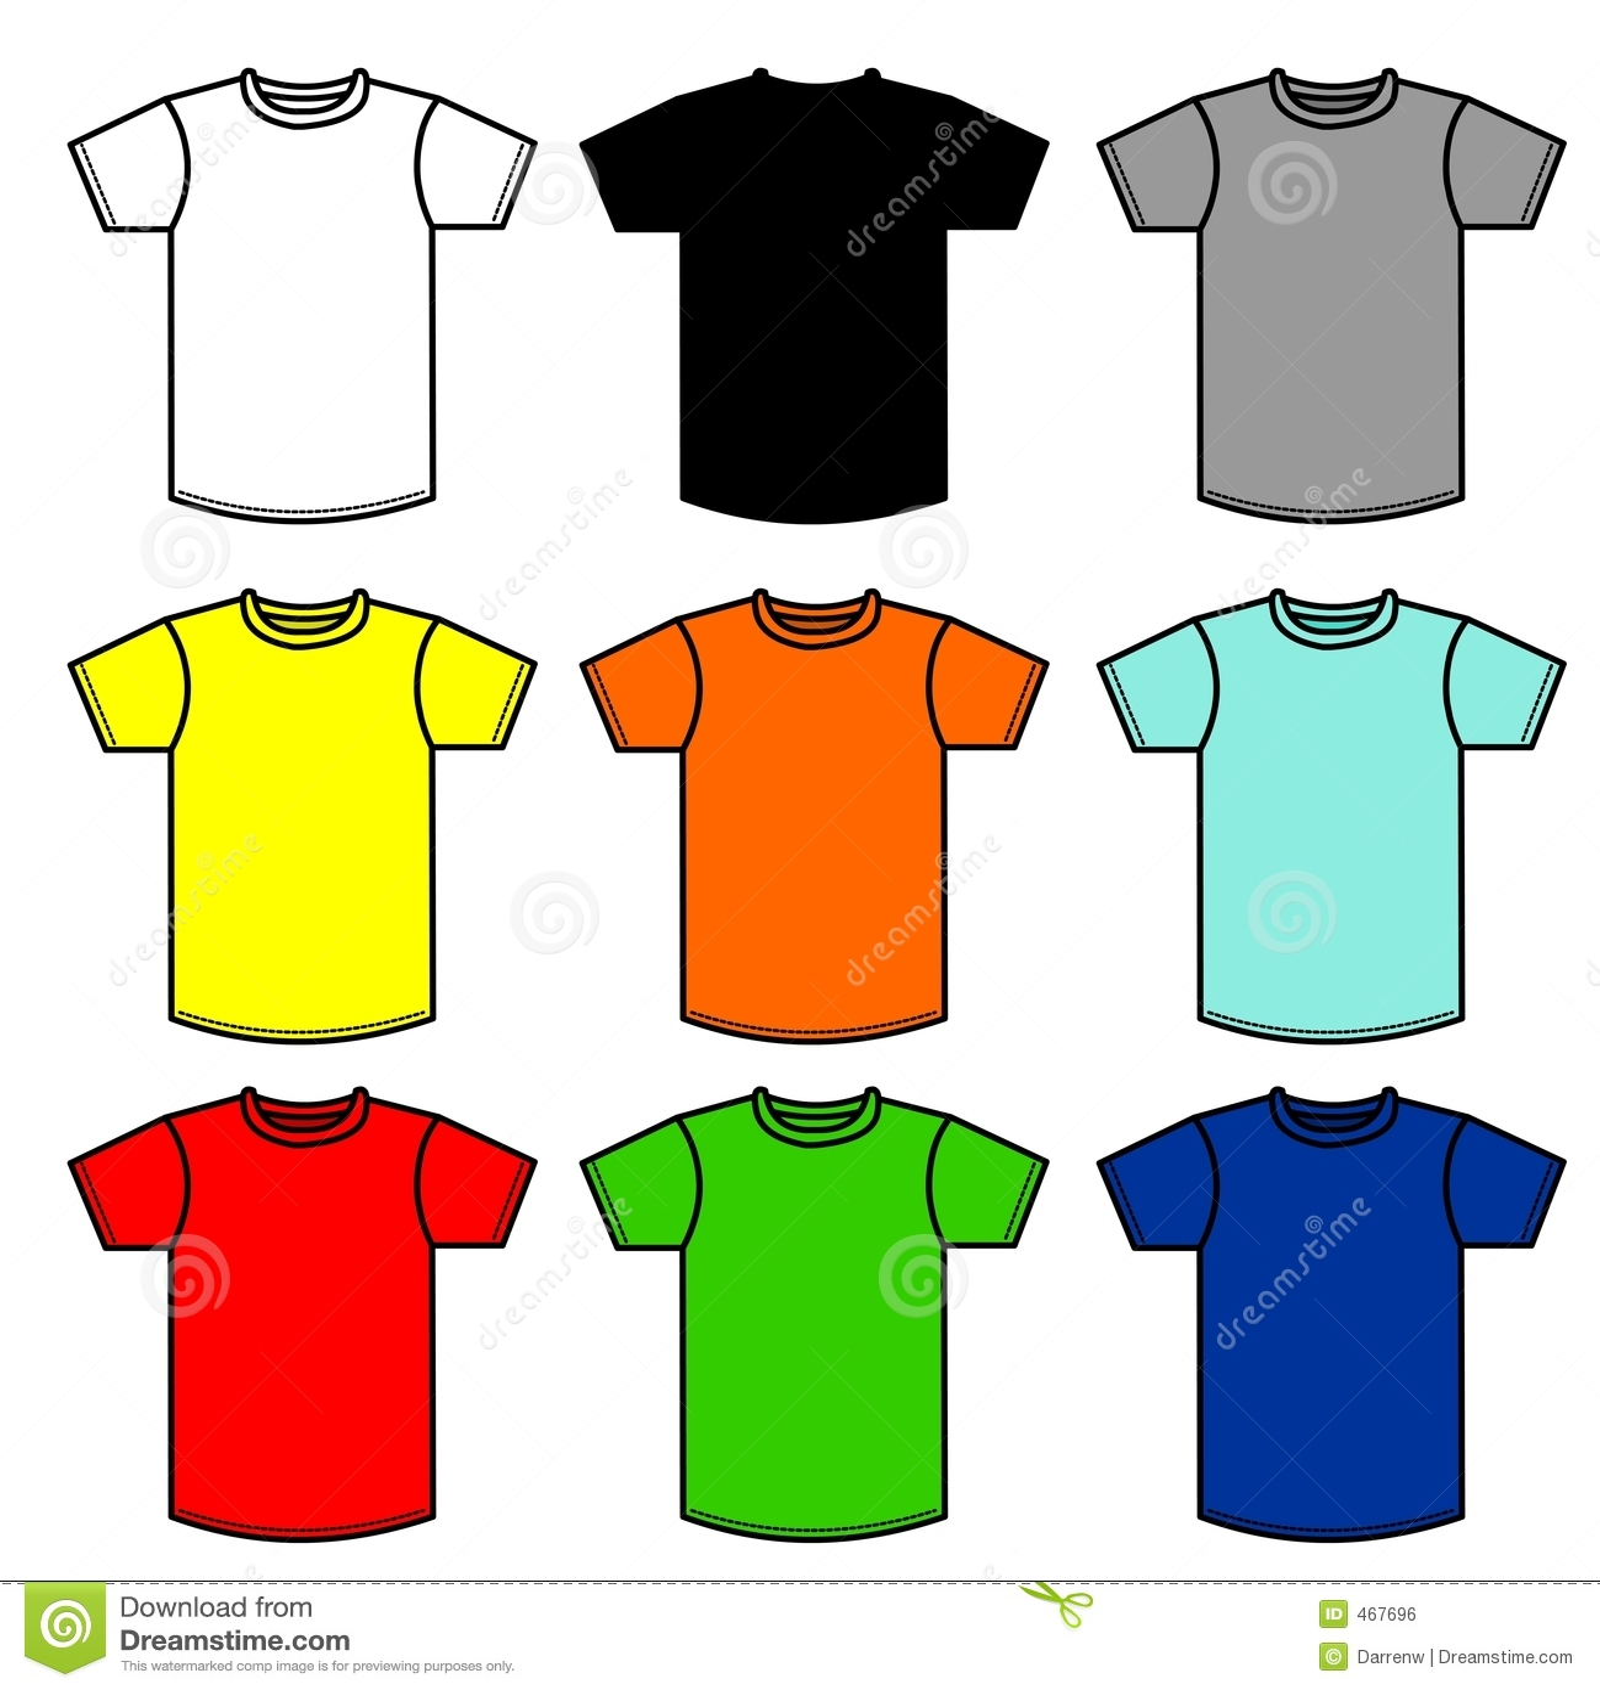 90 skjortor